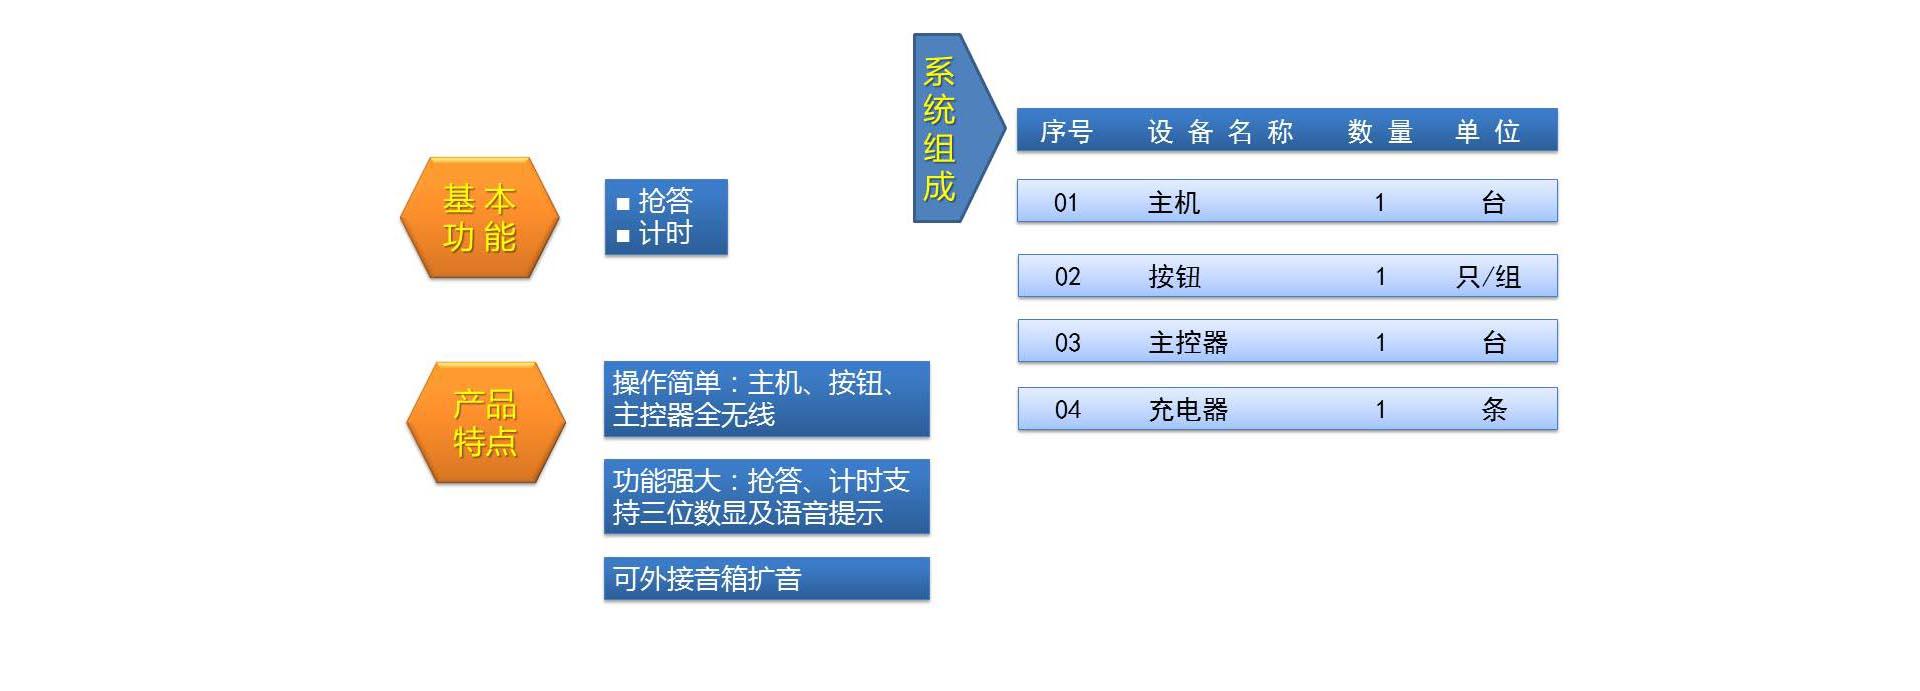 Product_top2_1315.JPG